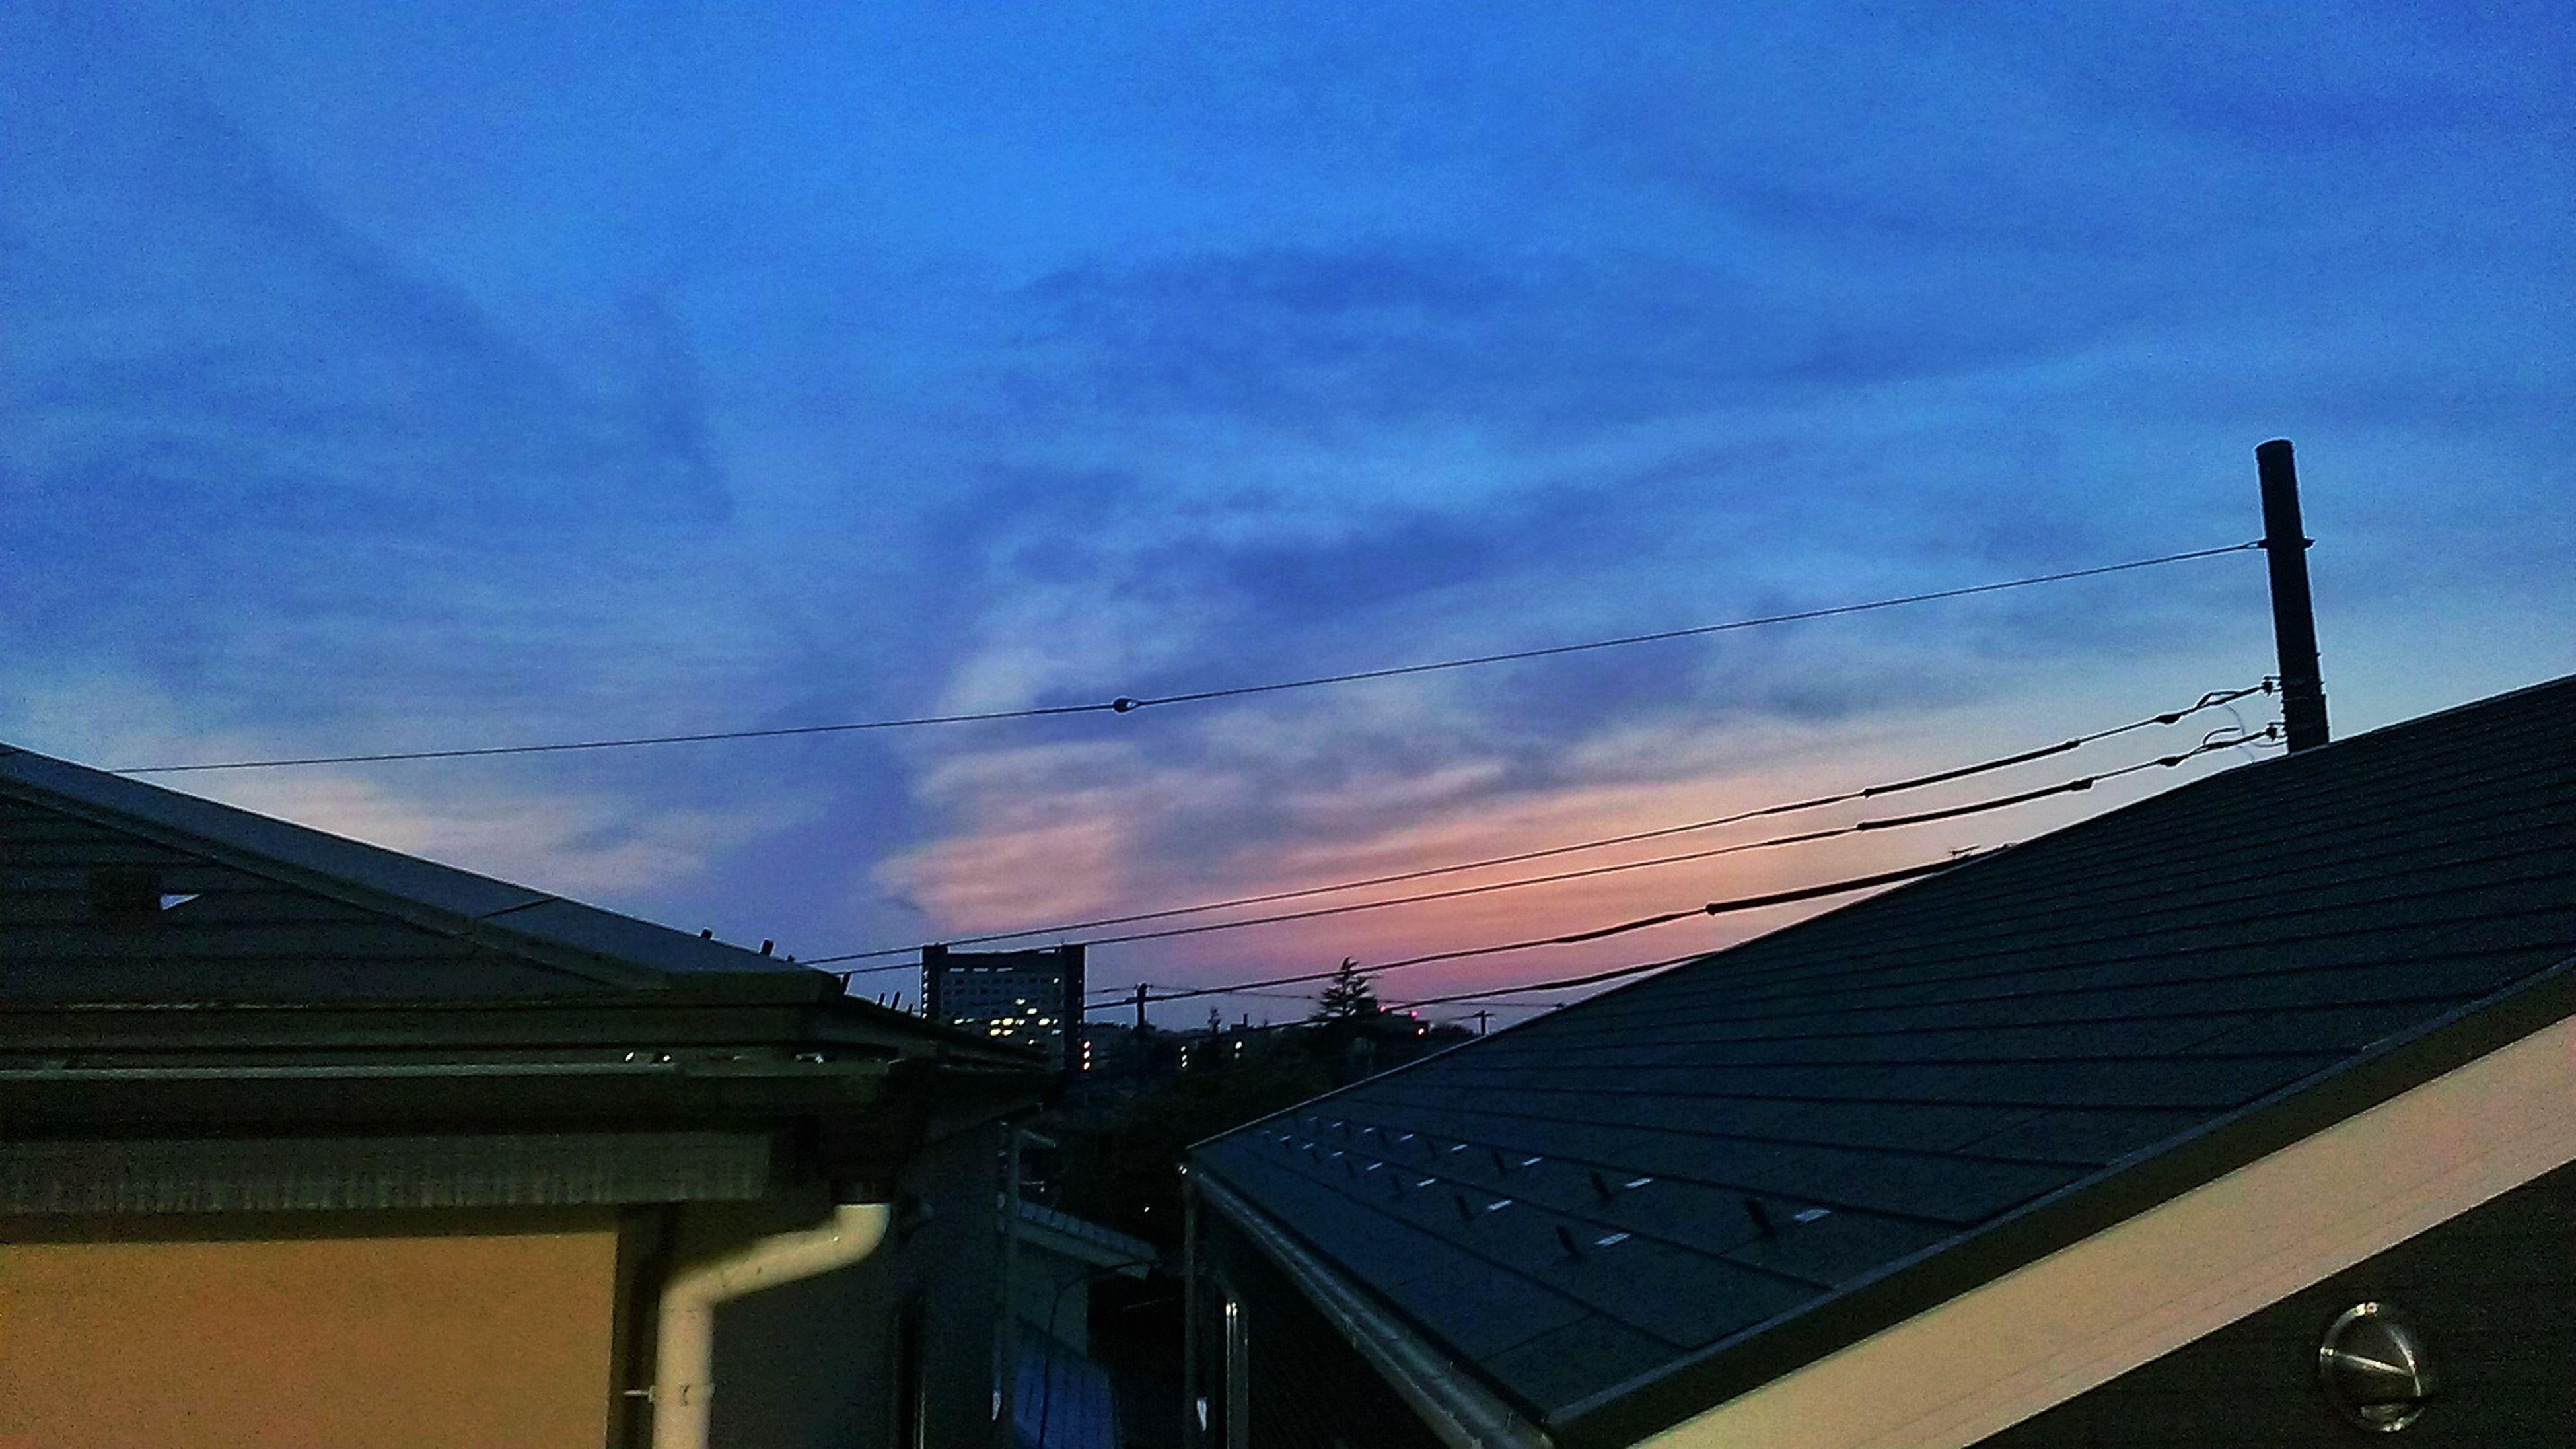 low angle view, sky, built structure, architecture, sunset, cloud - sky, connection, building exterior, silhouette, cloud, blue, railing, dusk, cloudy, outdoors, no people, bridge - man made structure, cable, nature, orange color